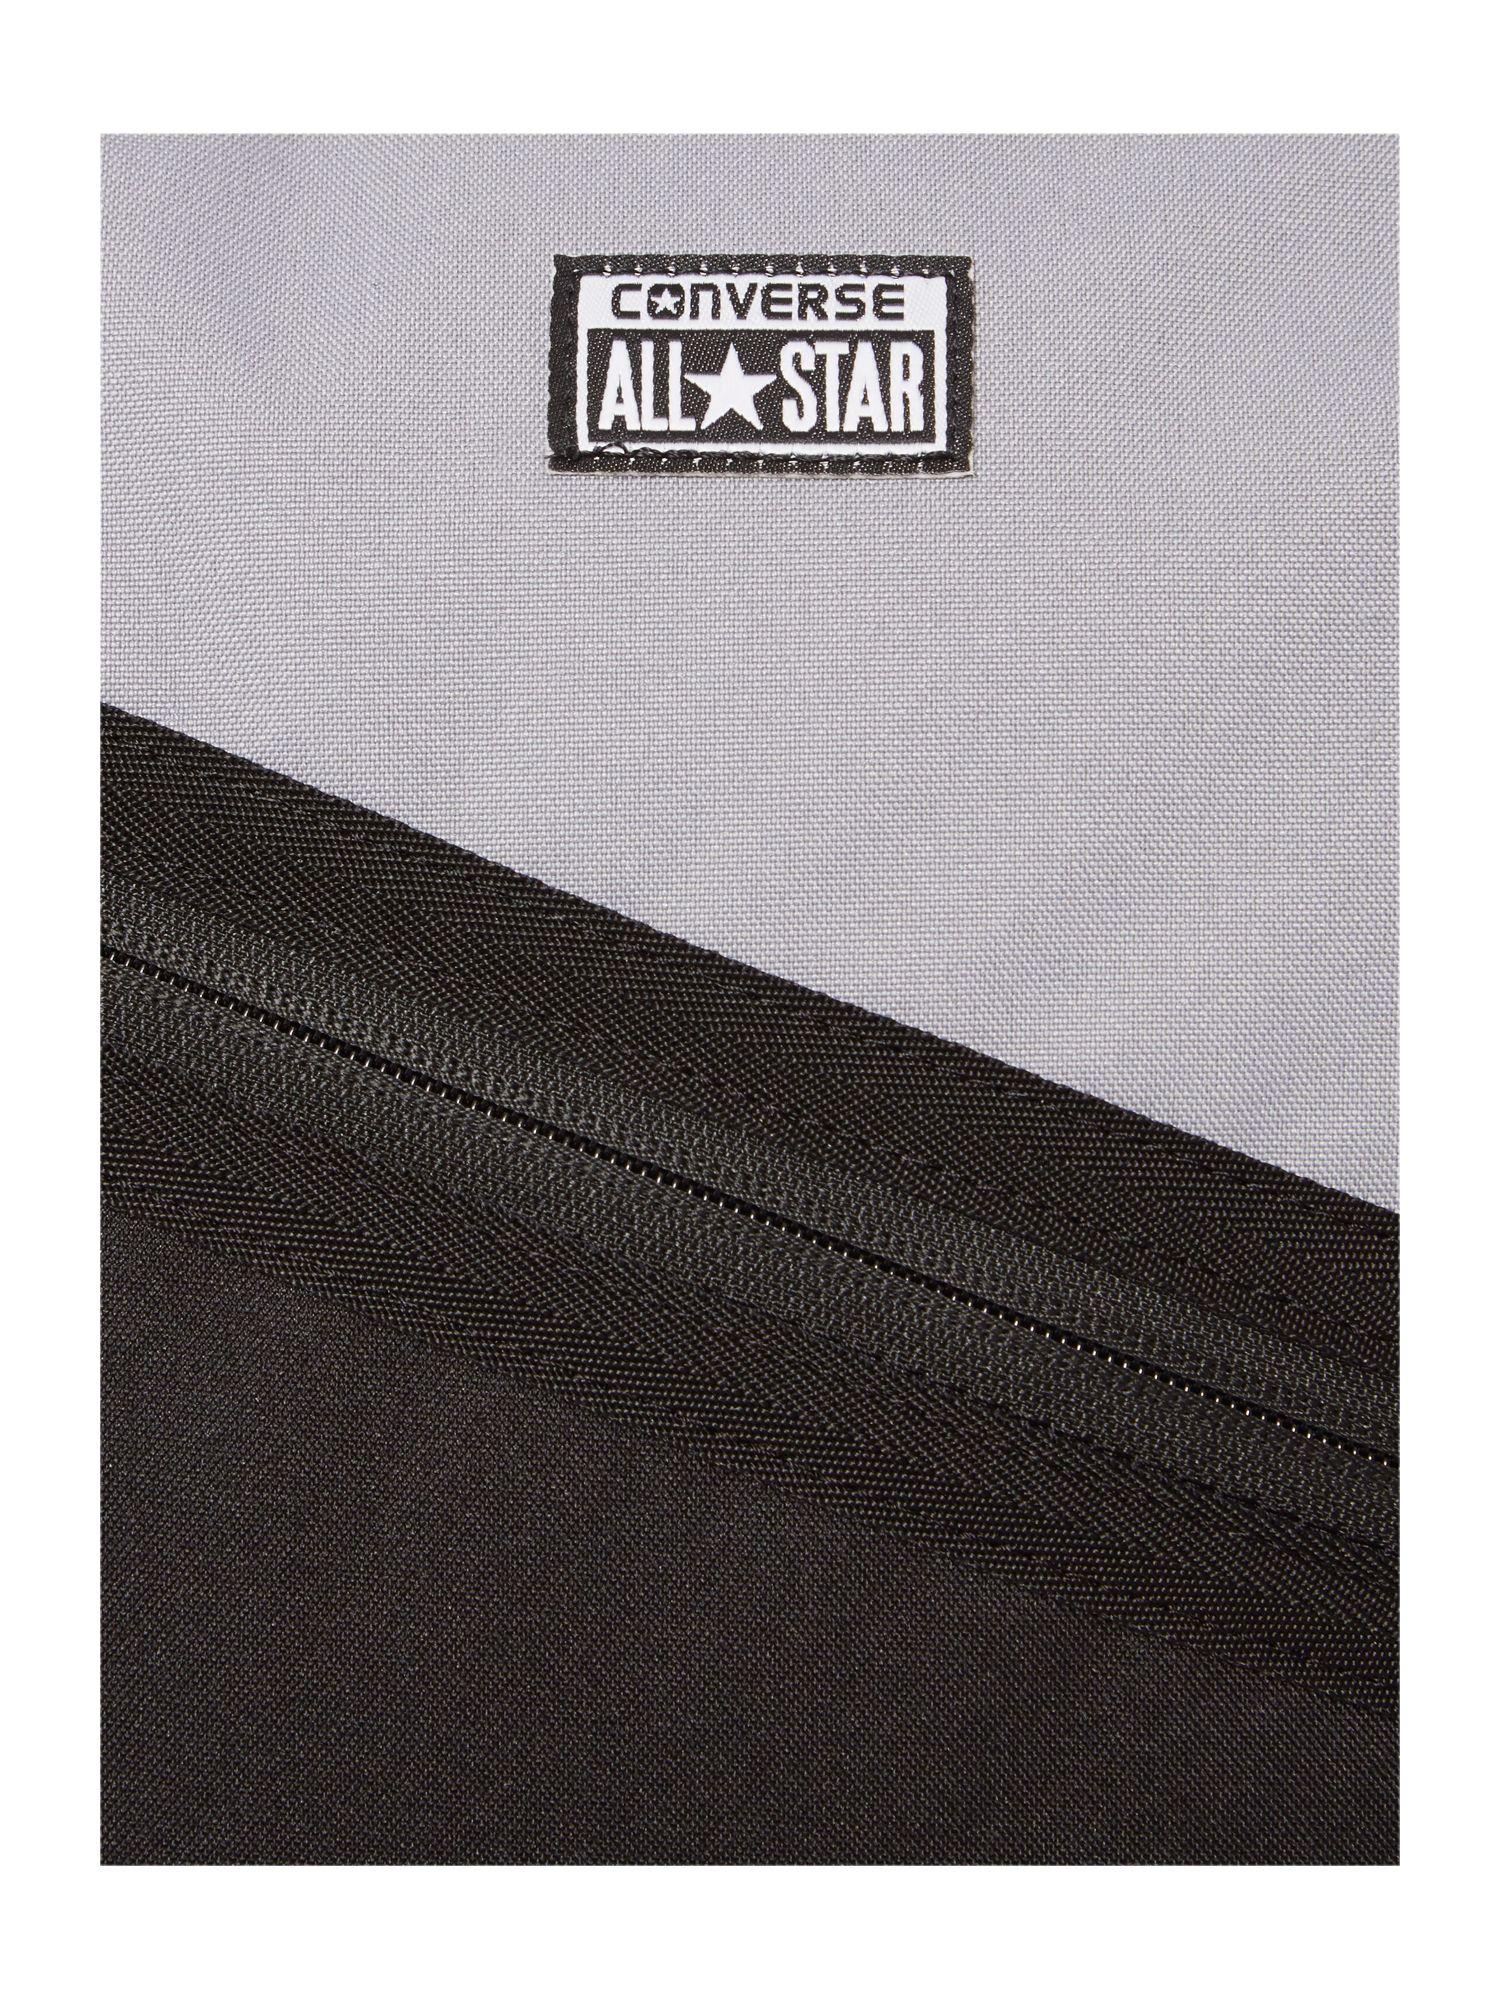 Converse Diagonal Zip Backpack in Black for Men - Lyst cb962a06e7ba5